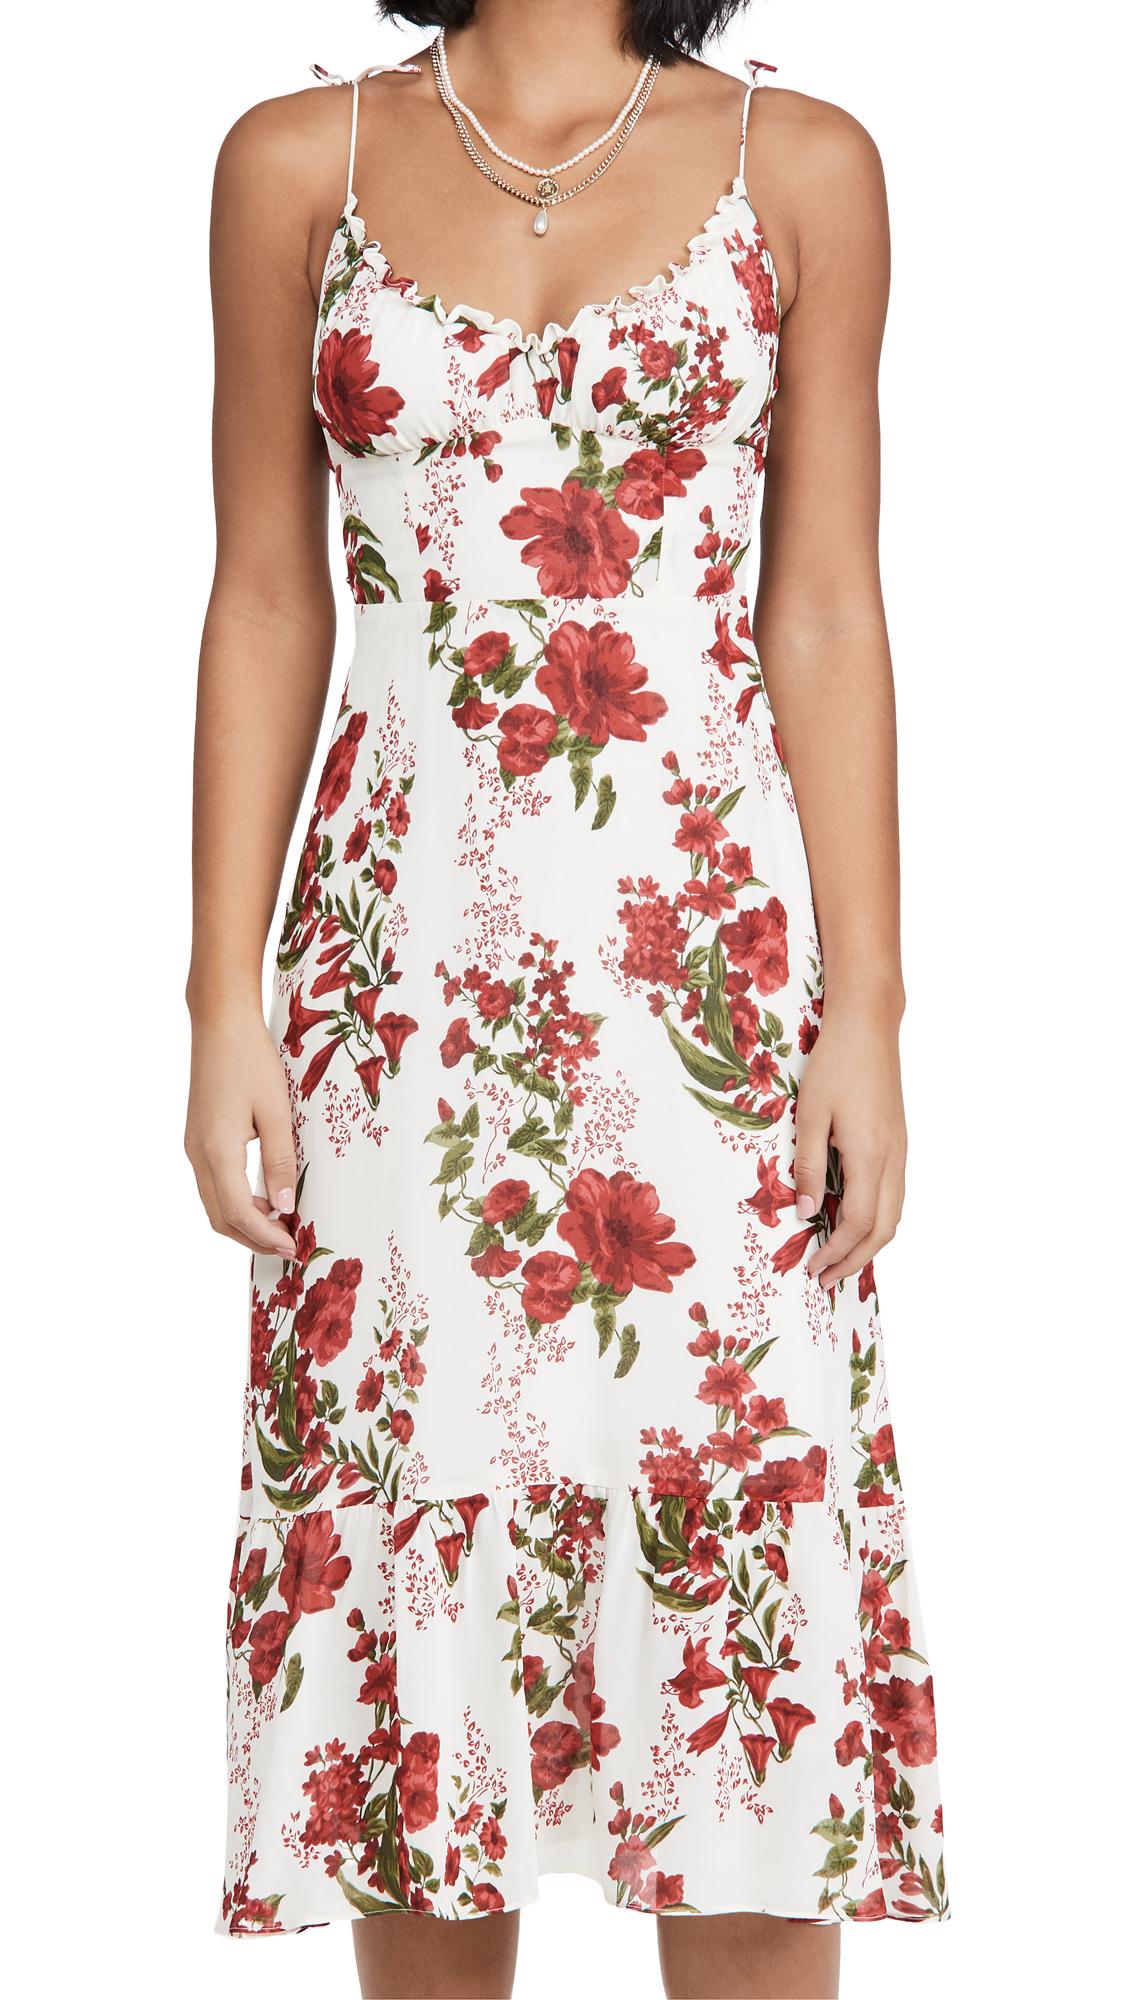 Reformation Embry Dress